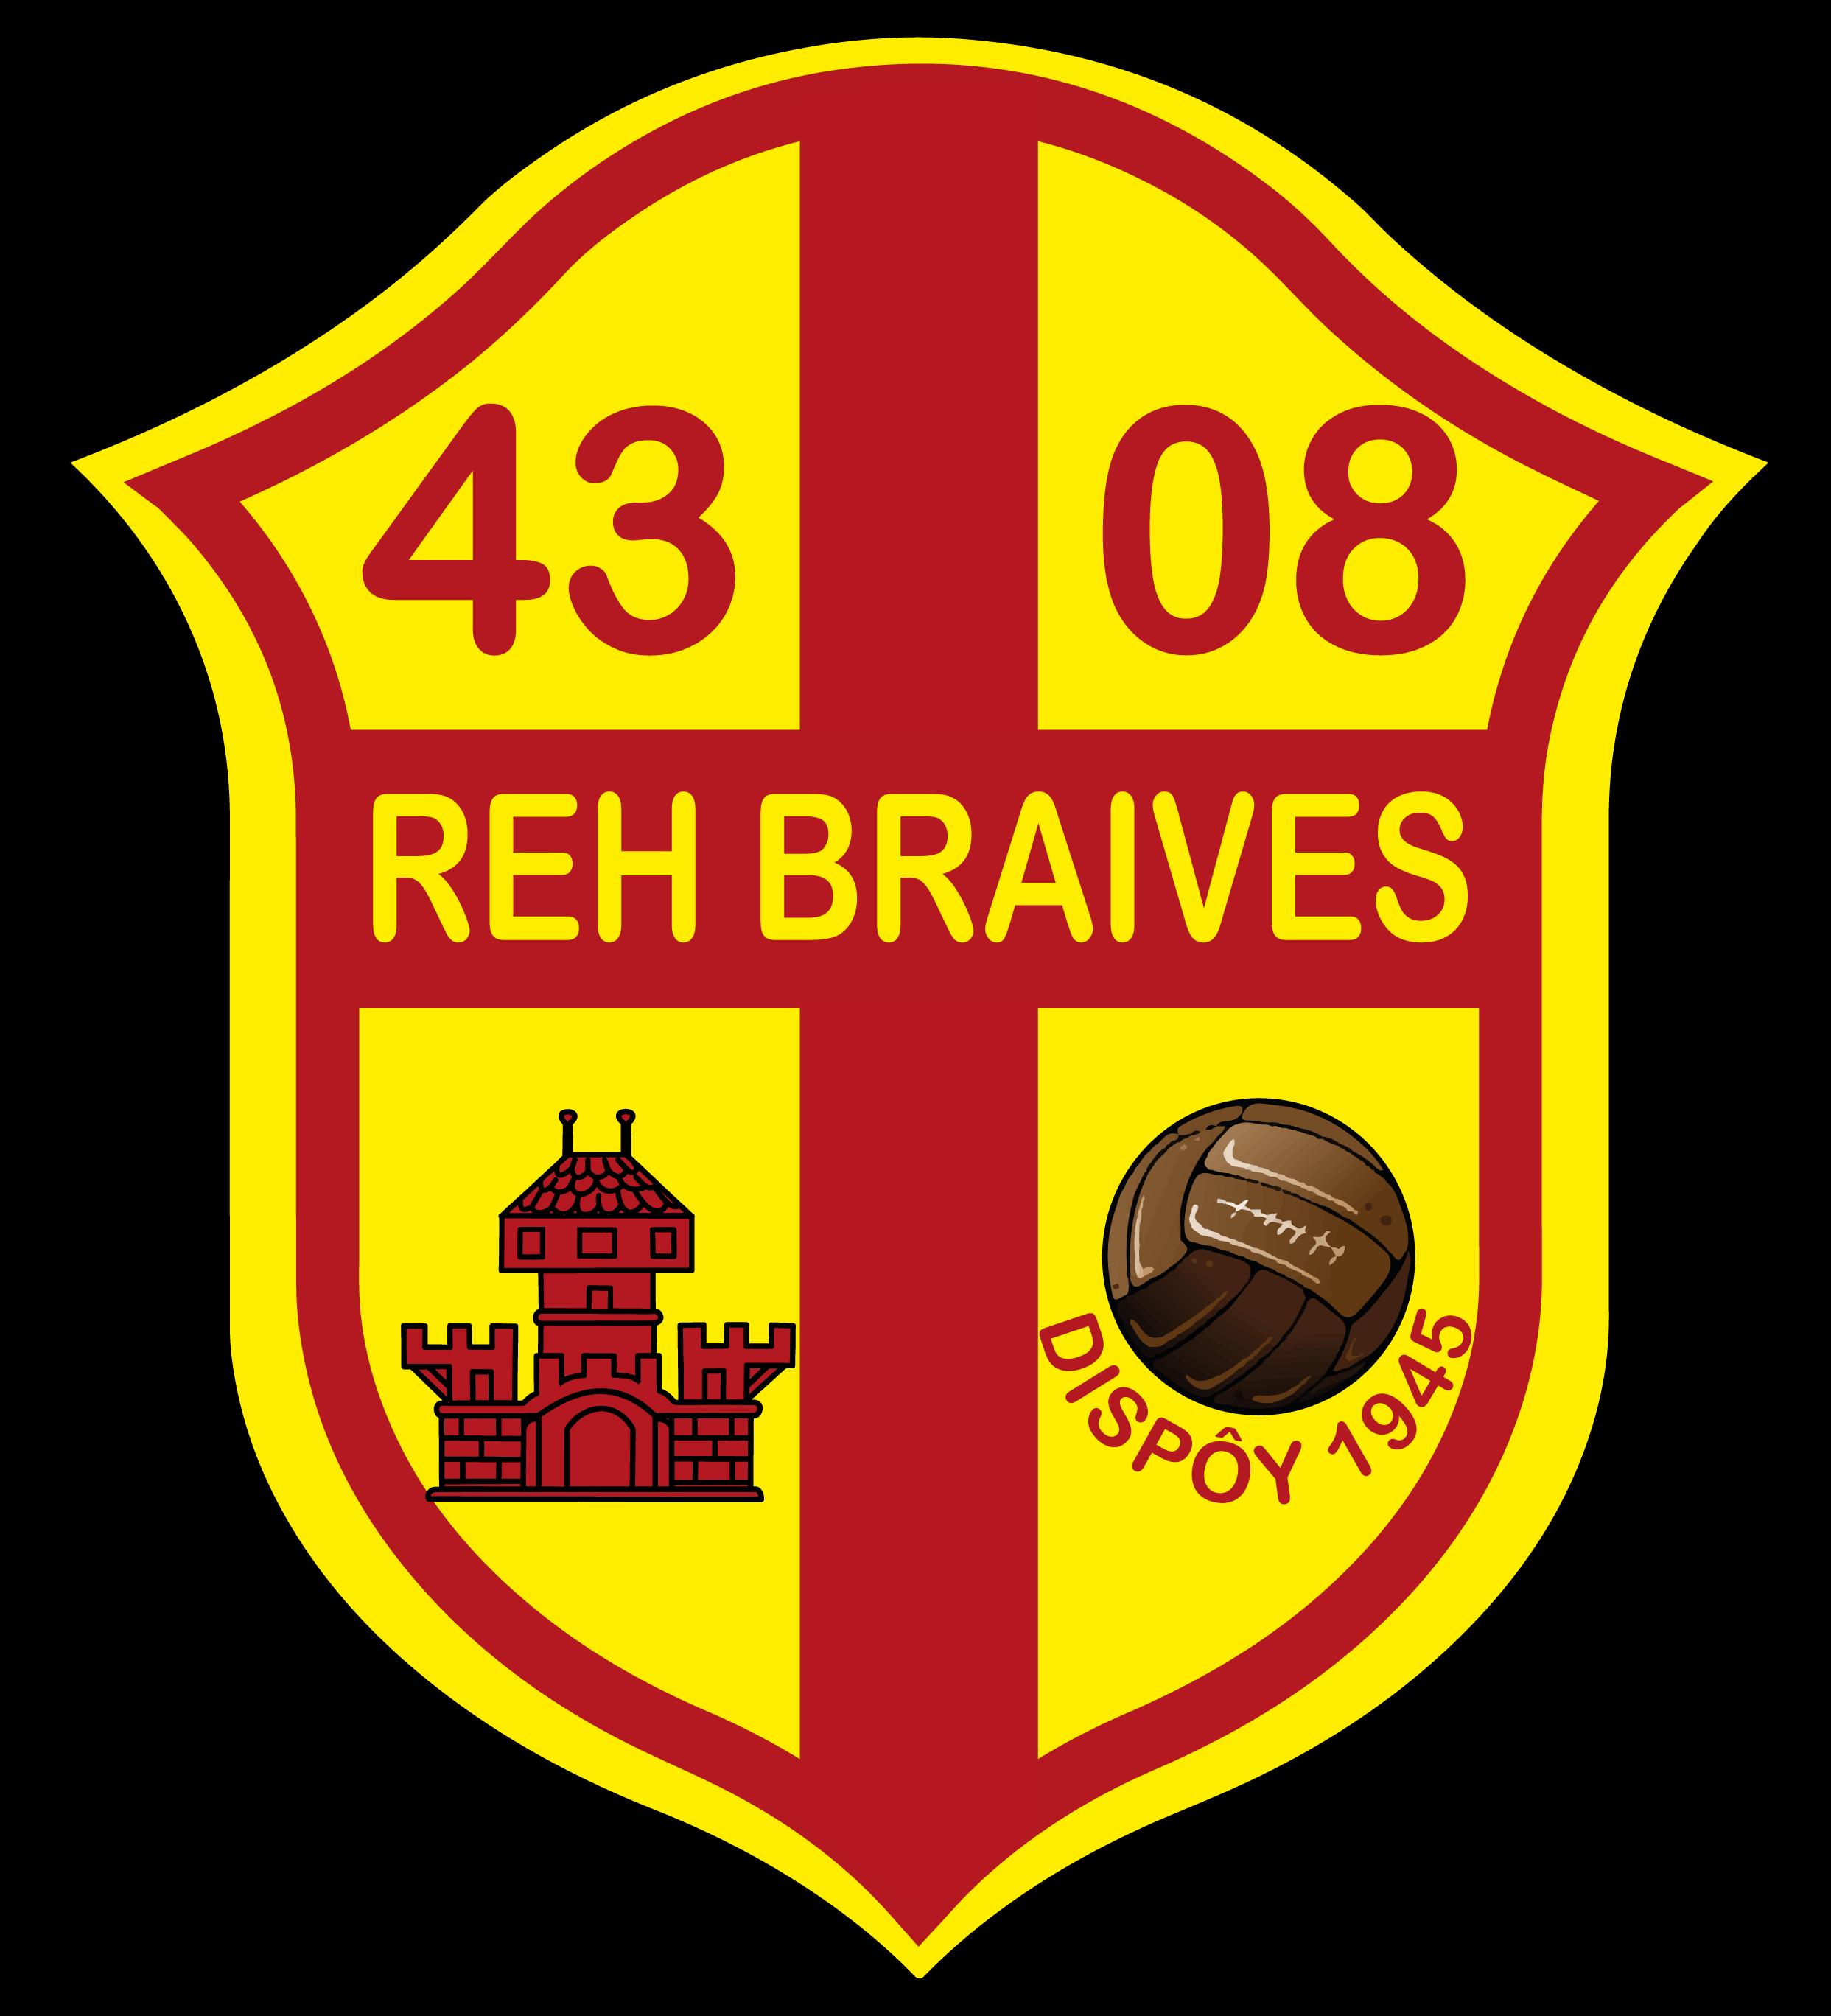 14 - Braives B